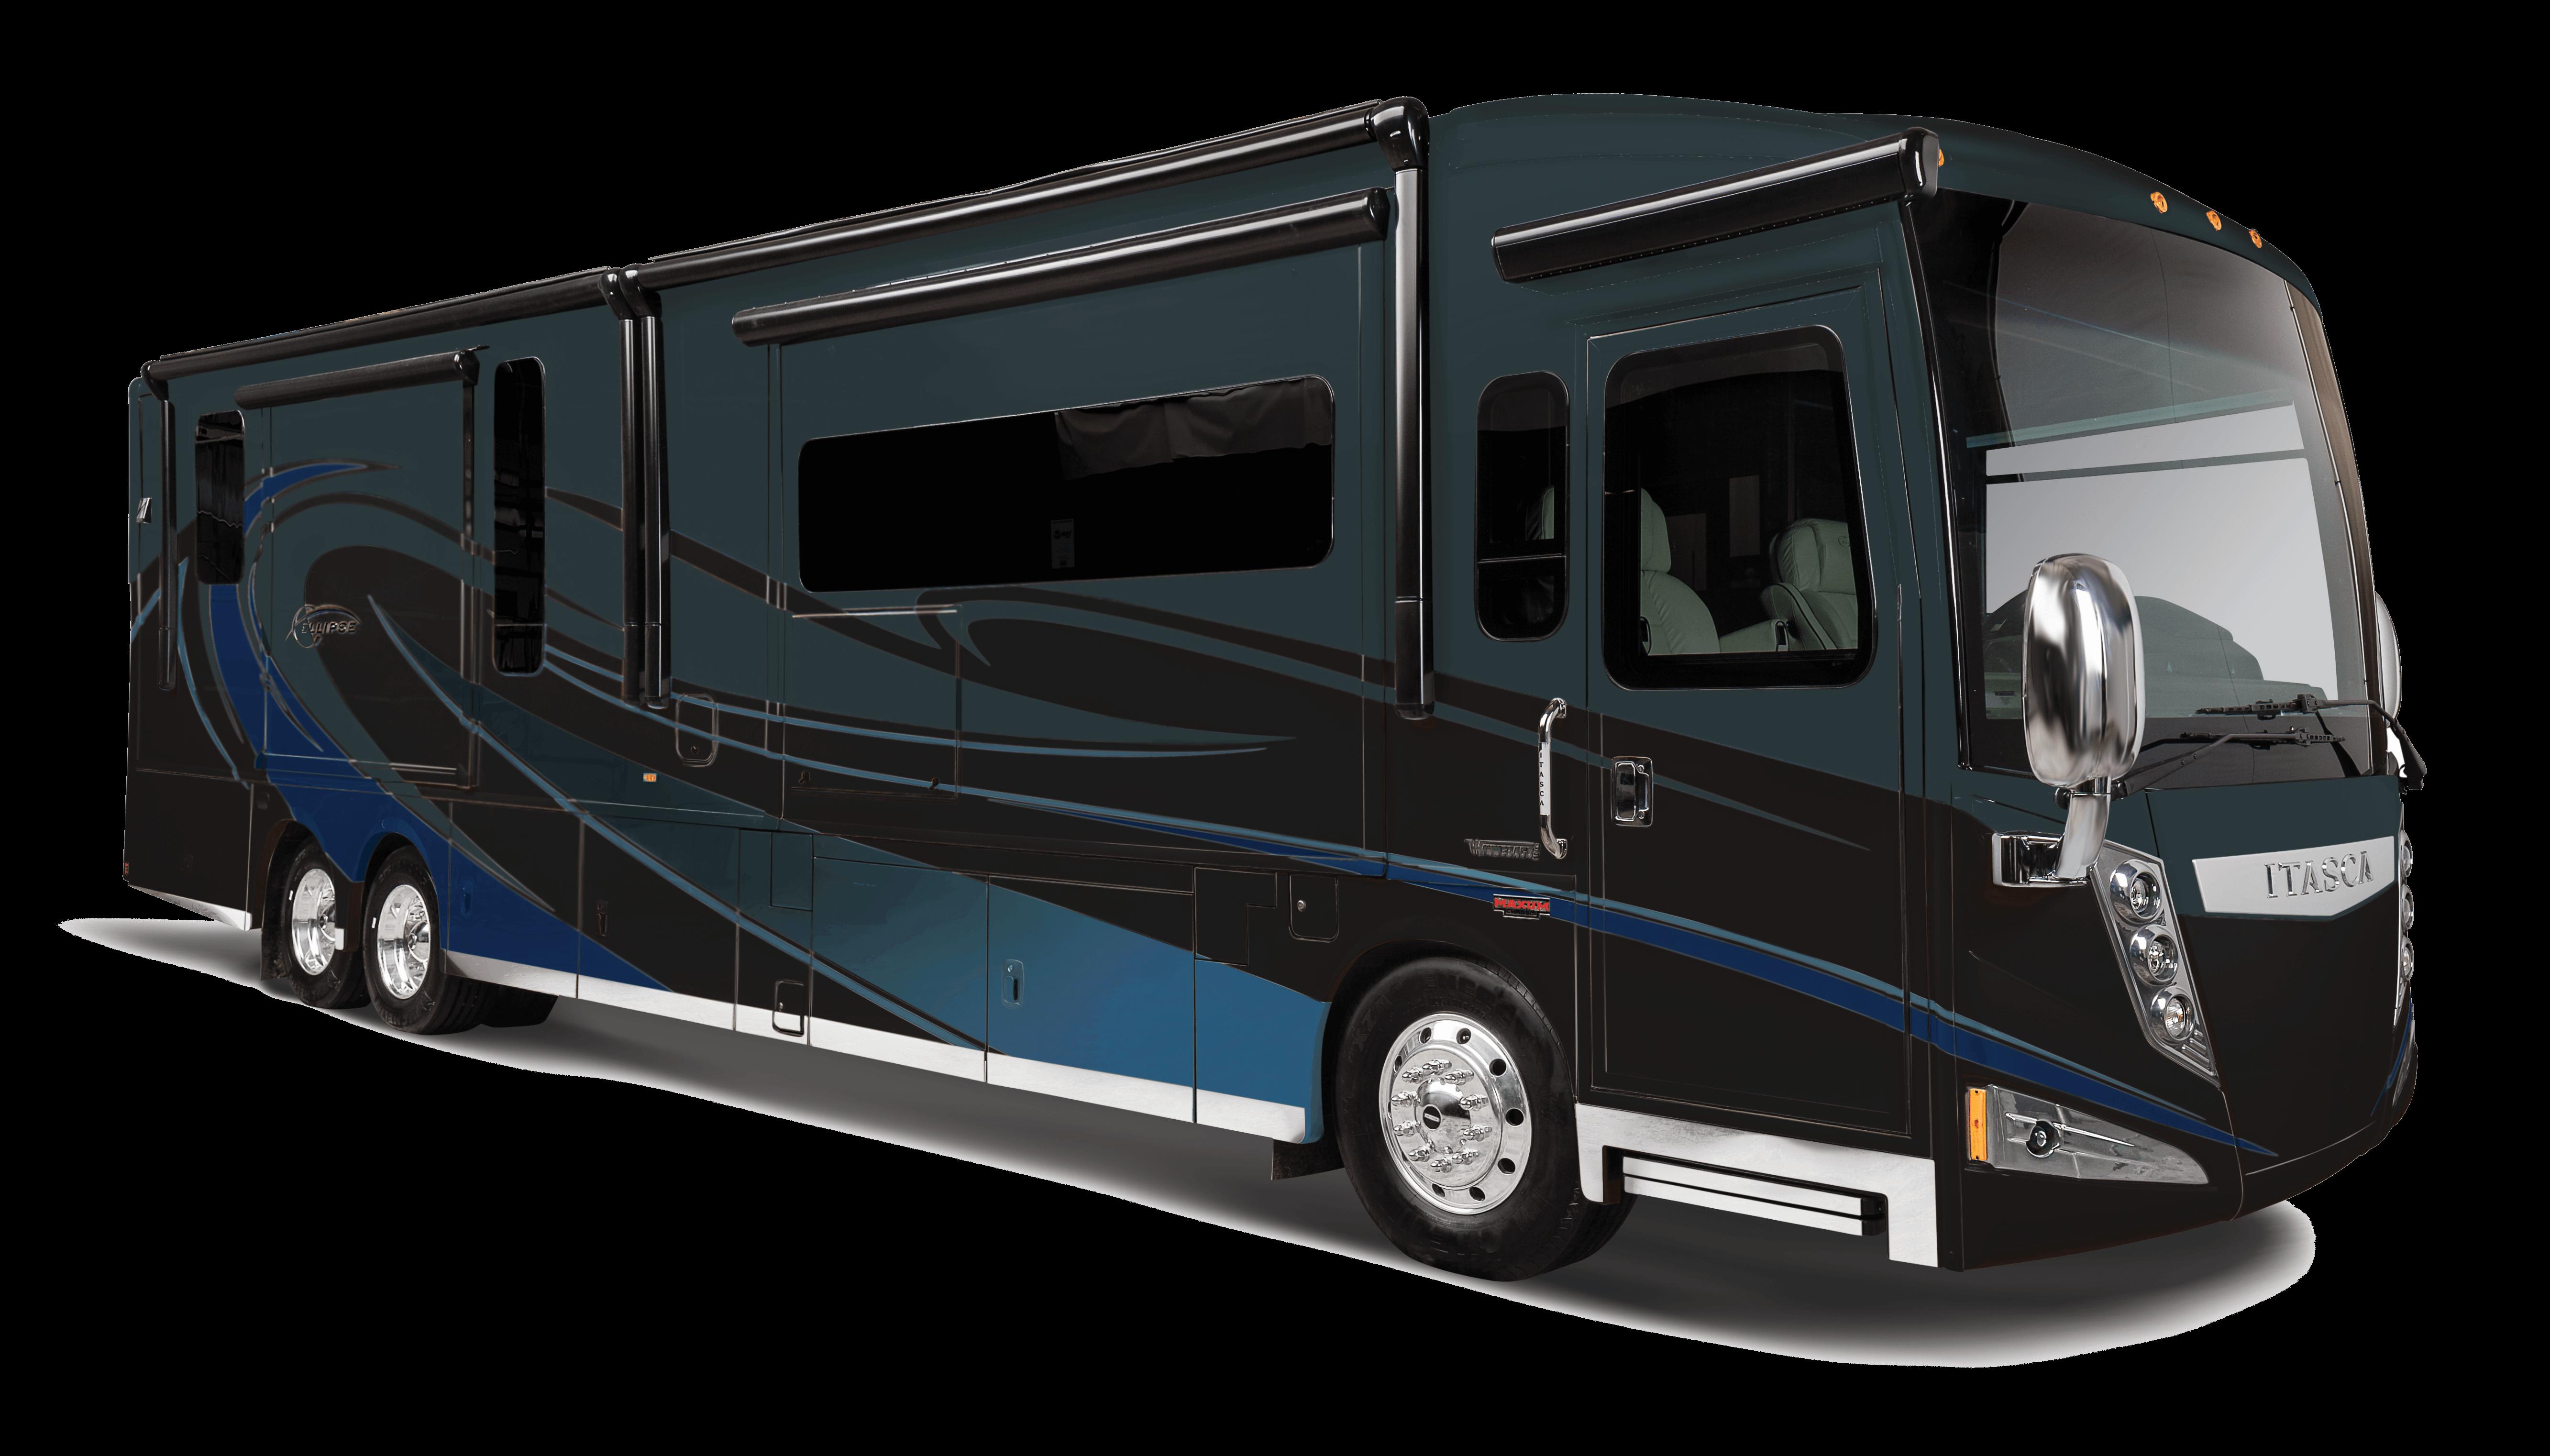 Itasca Ellipse Class A Diesel Motorhome